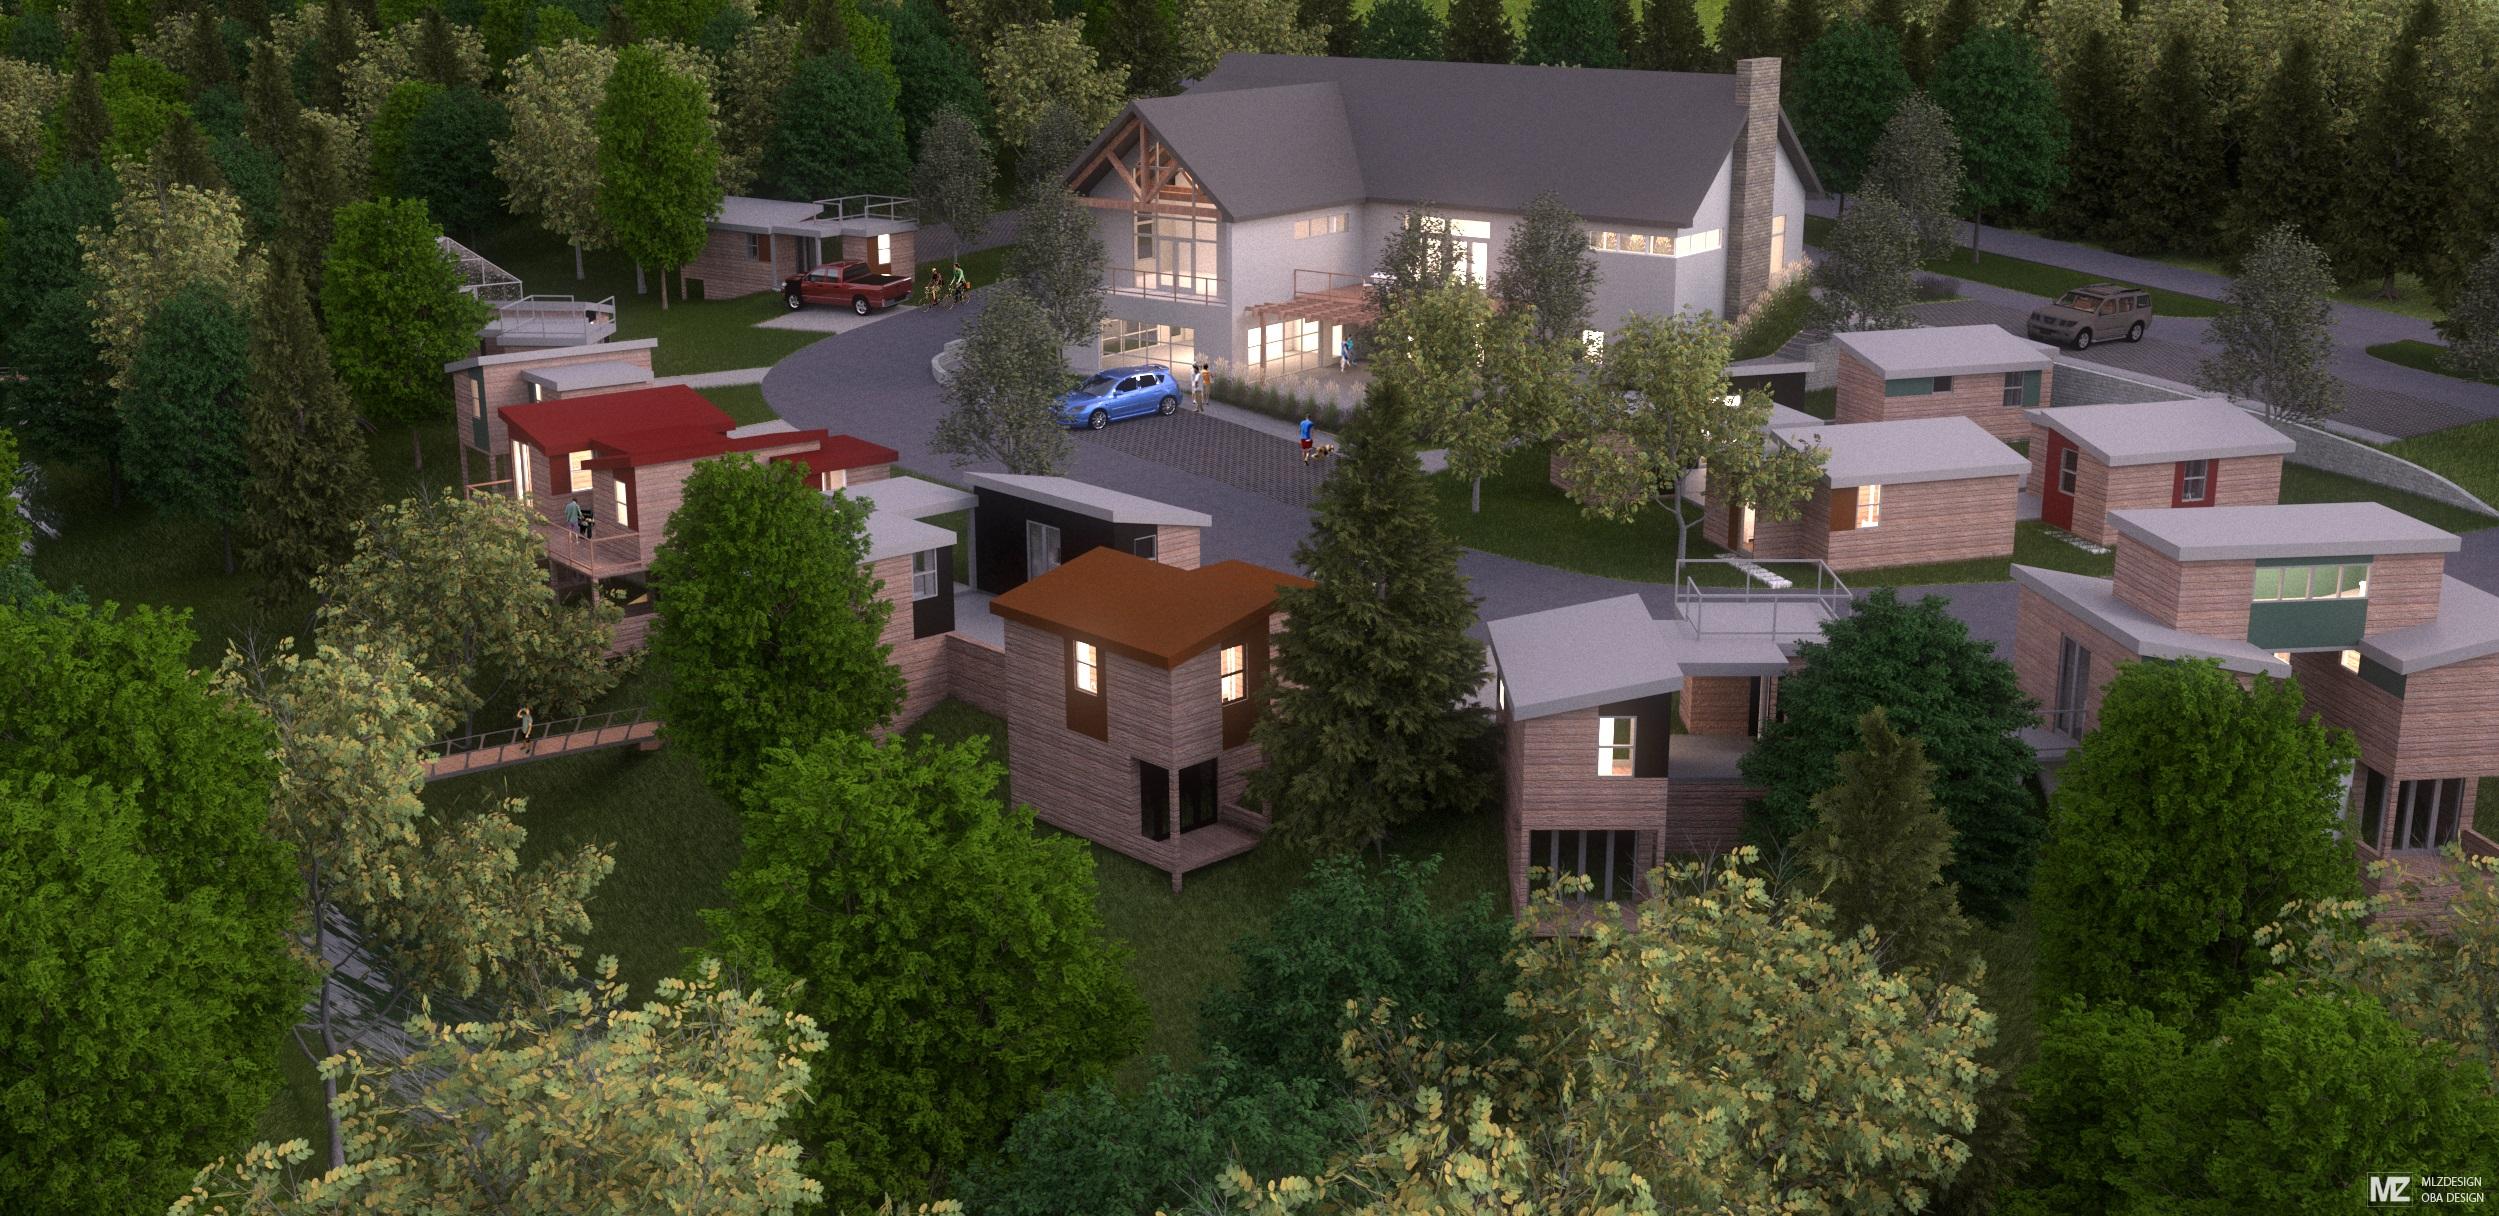 Micro Homes for Veterans Community